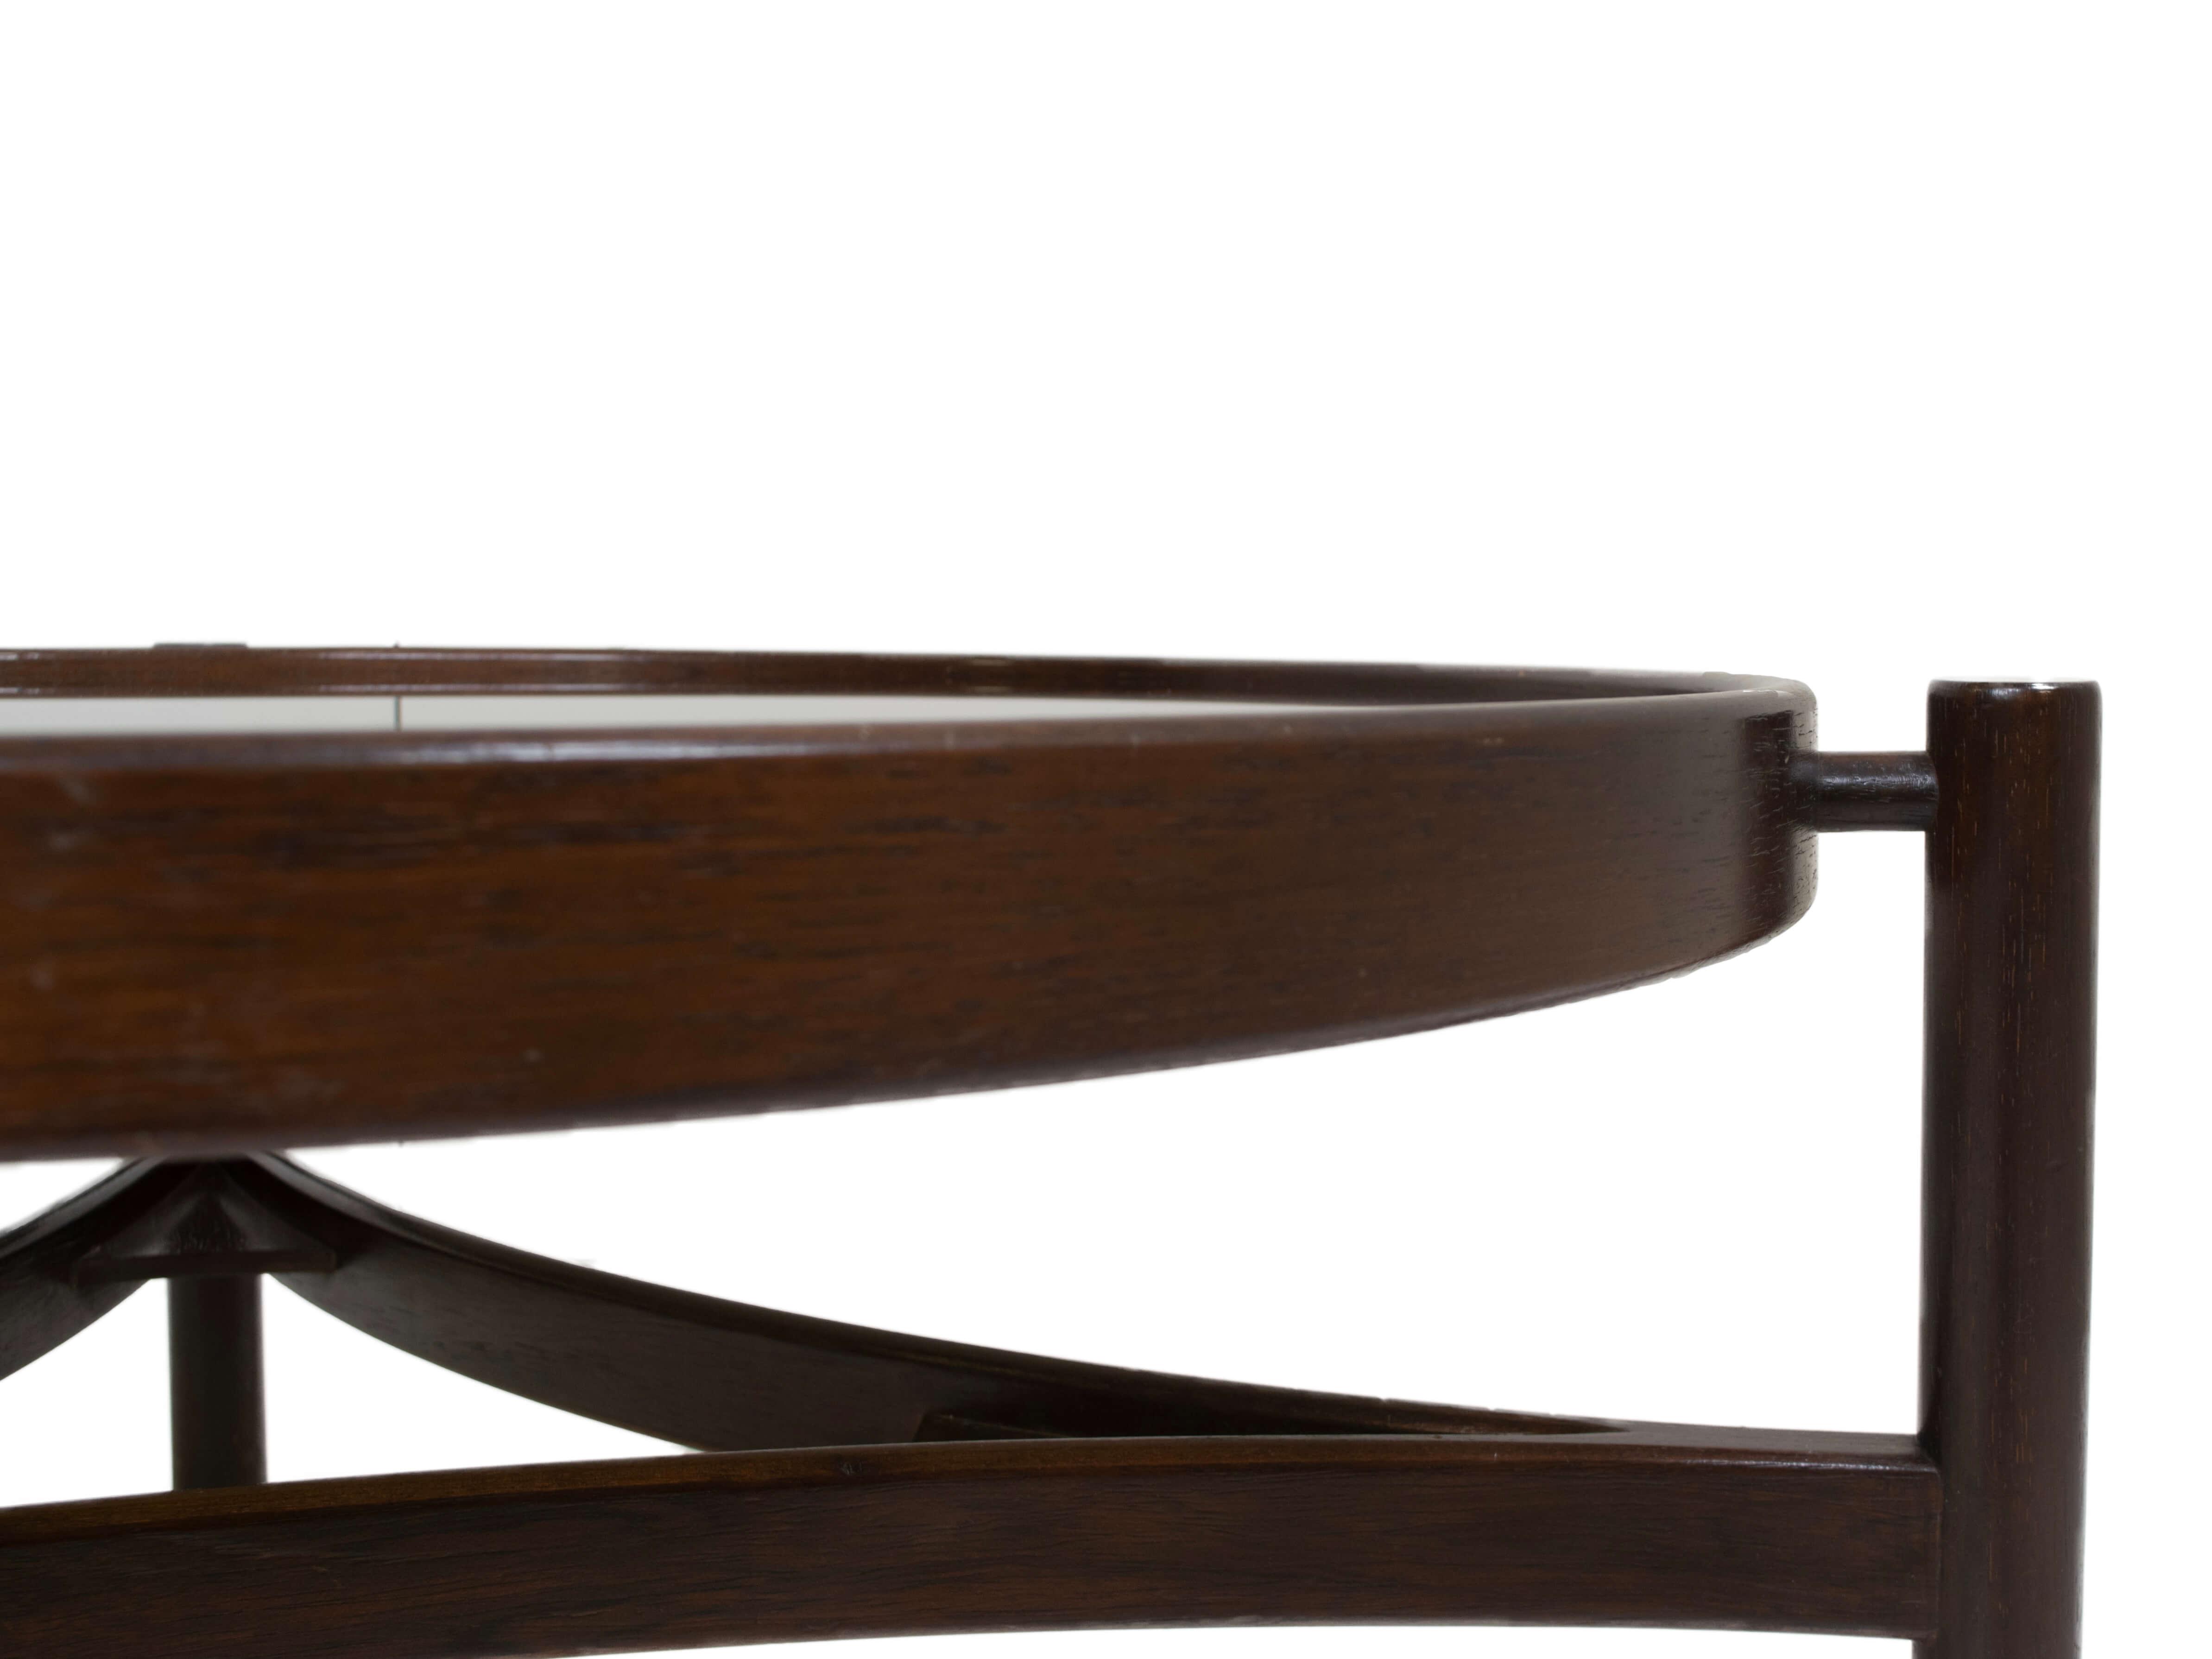 Details Round Italian Modern Coffee Table Model 775 by Gianfranco Frattini